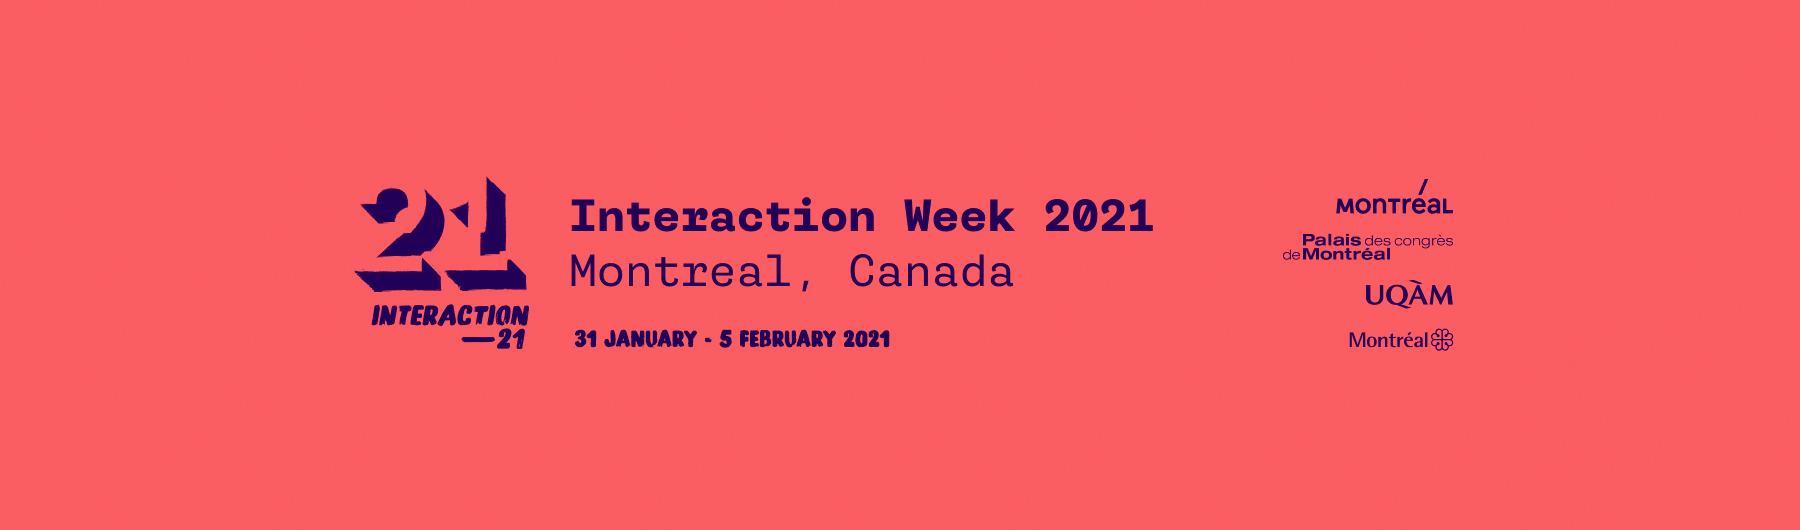 Interaction 21